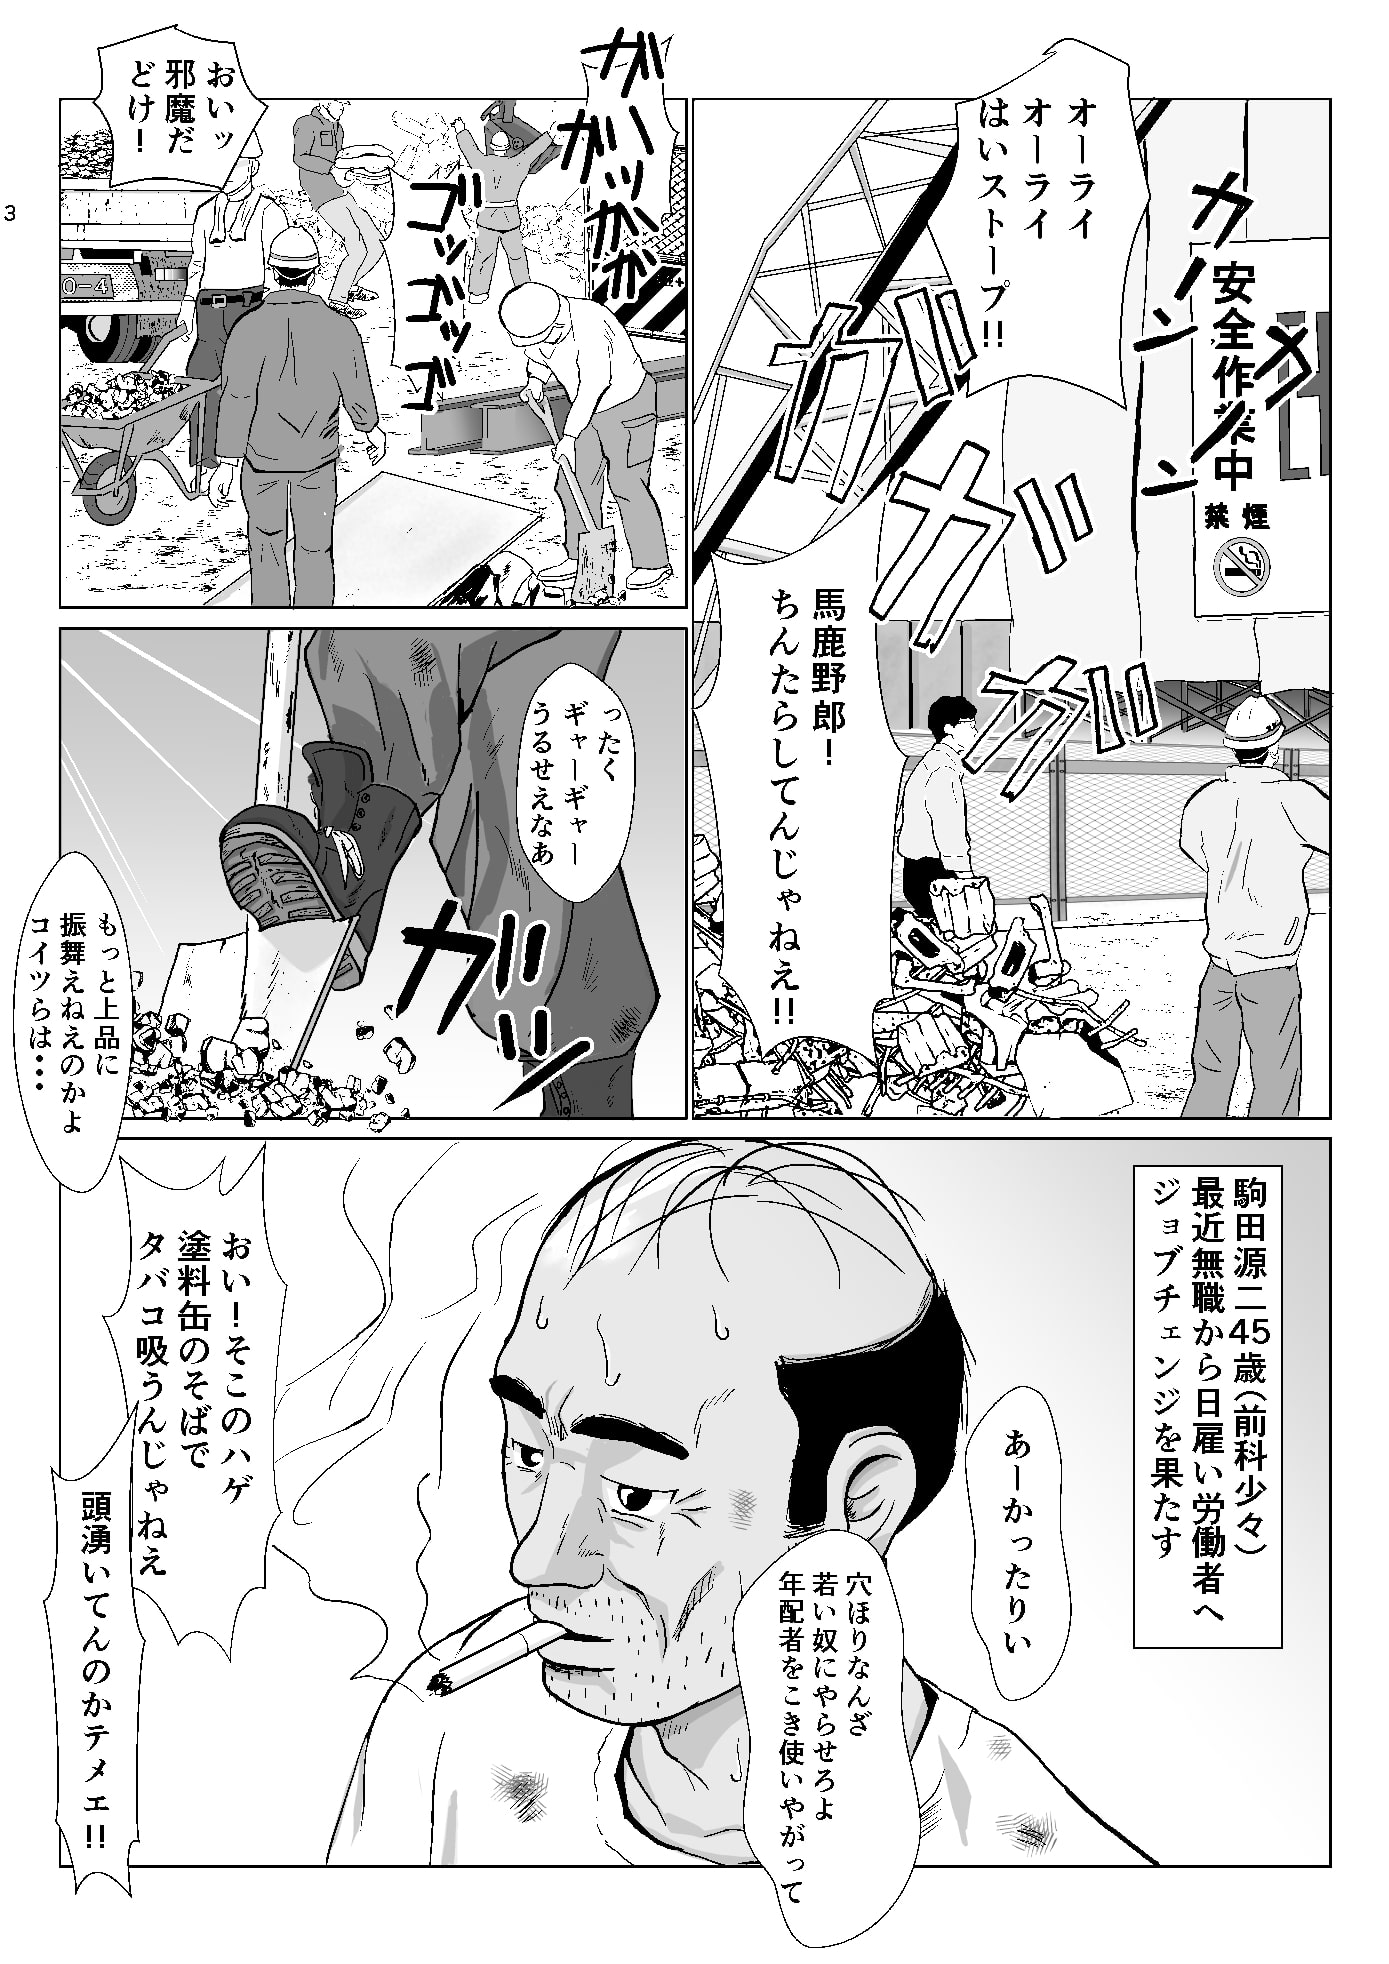 RJ325660 乱暴おじさん2 [20210501]